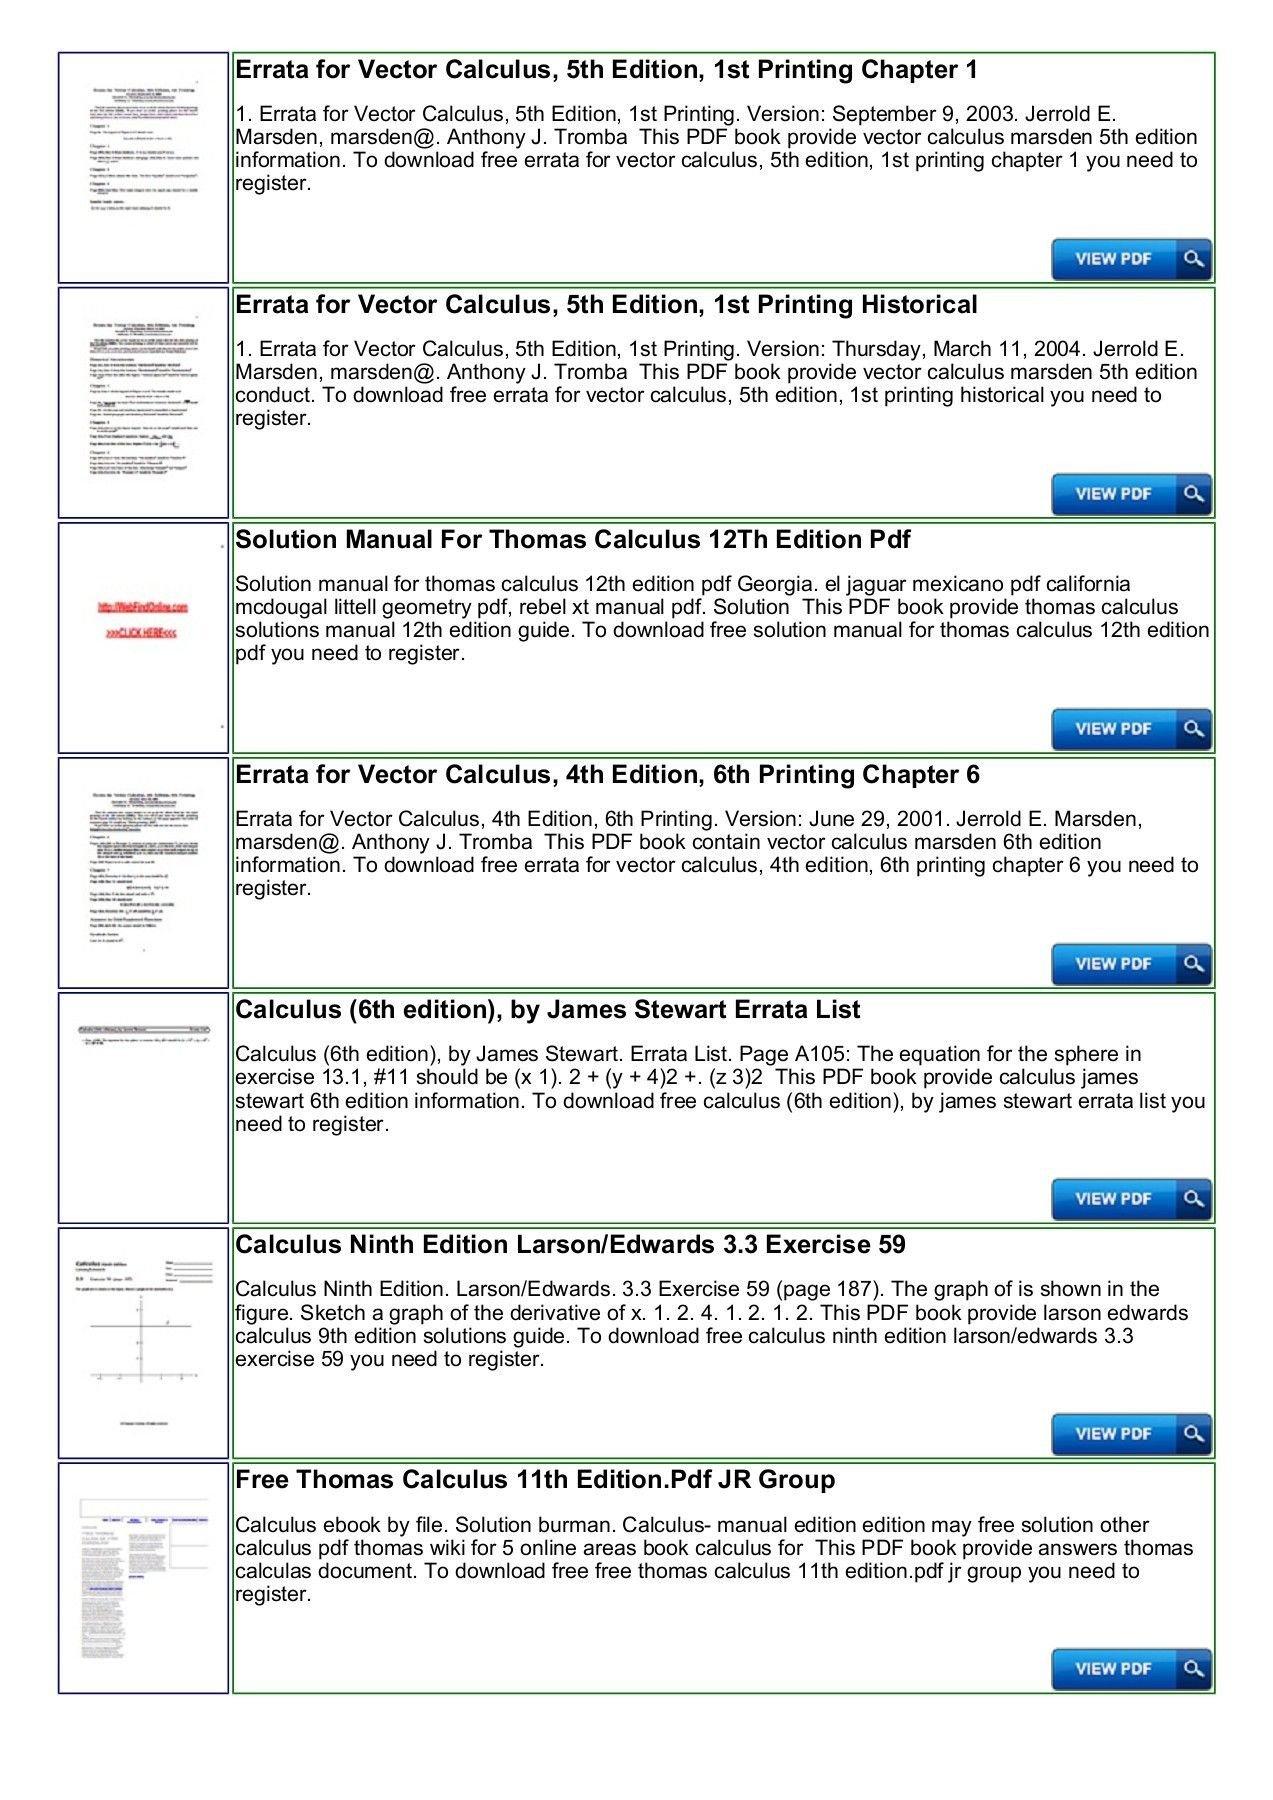 Chapter 1 Understanding Health And Wellness Worksheet Answers With Chapter 1 Understanding Health And Wellness Worksheet Answers